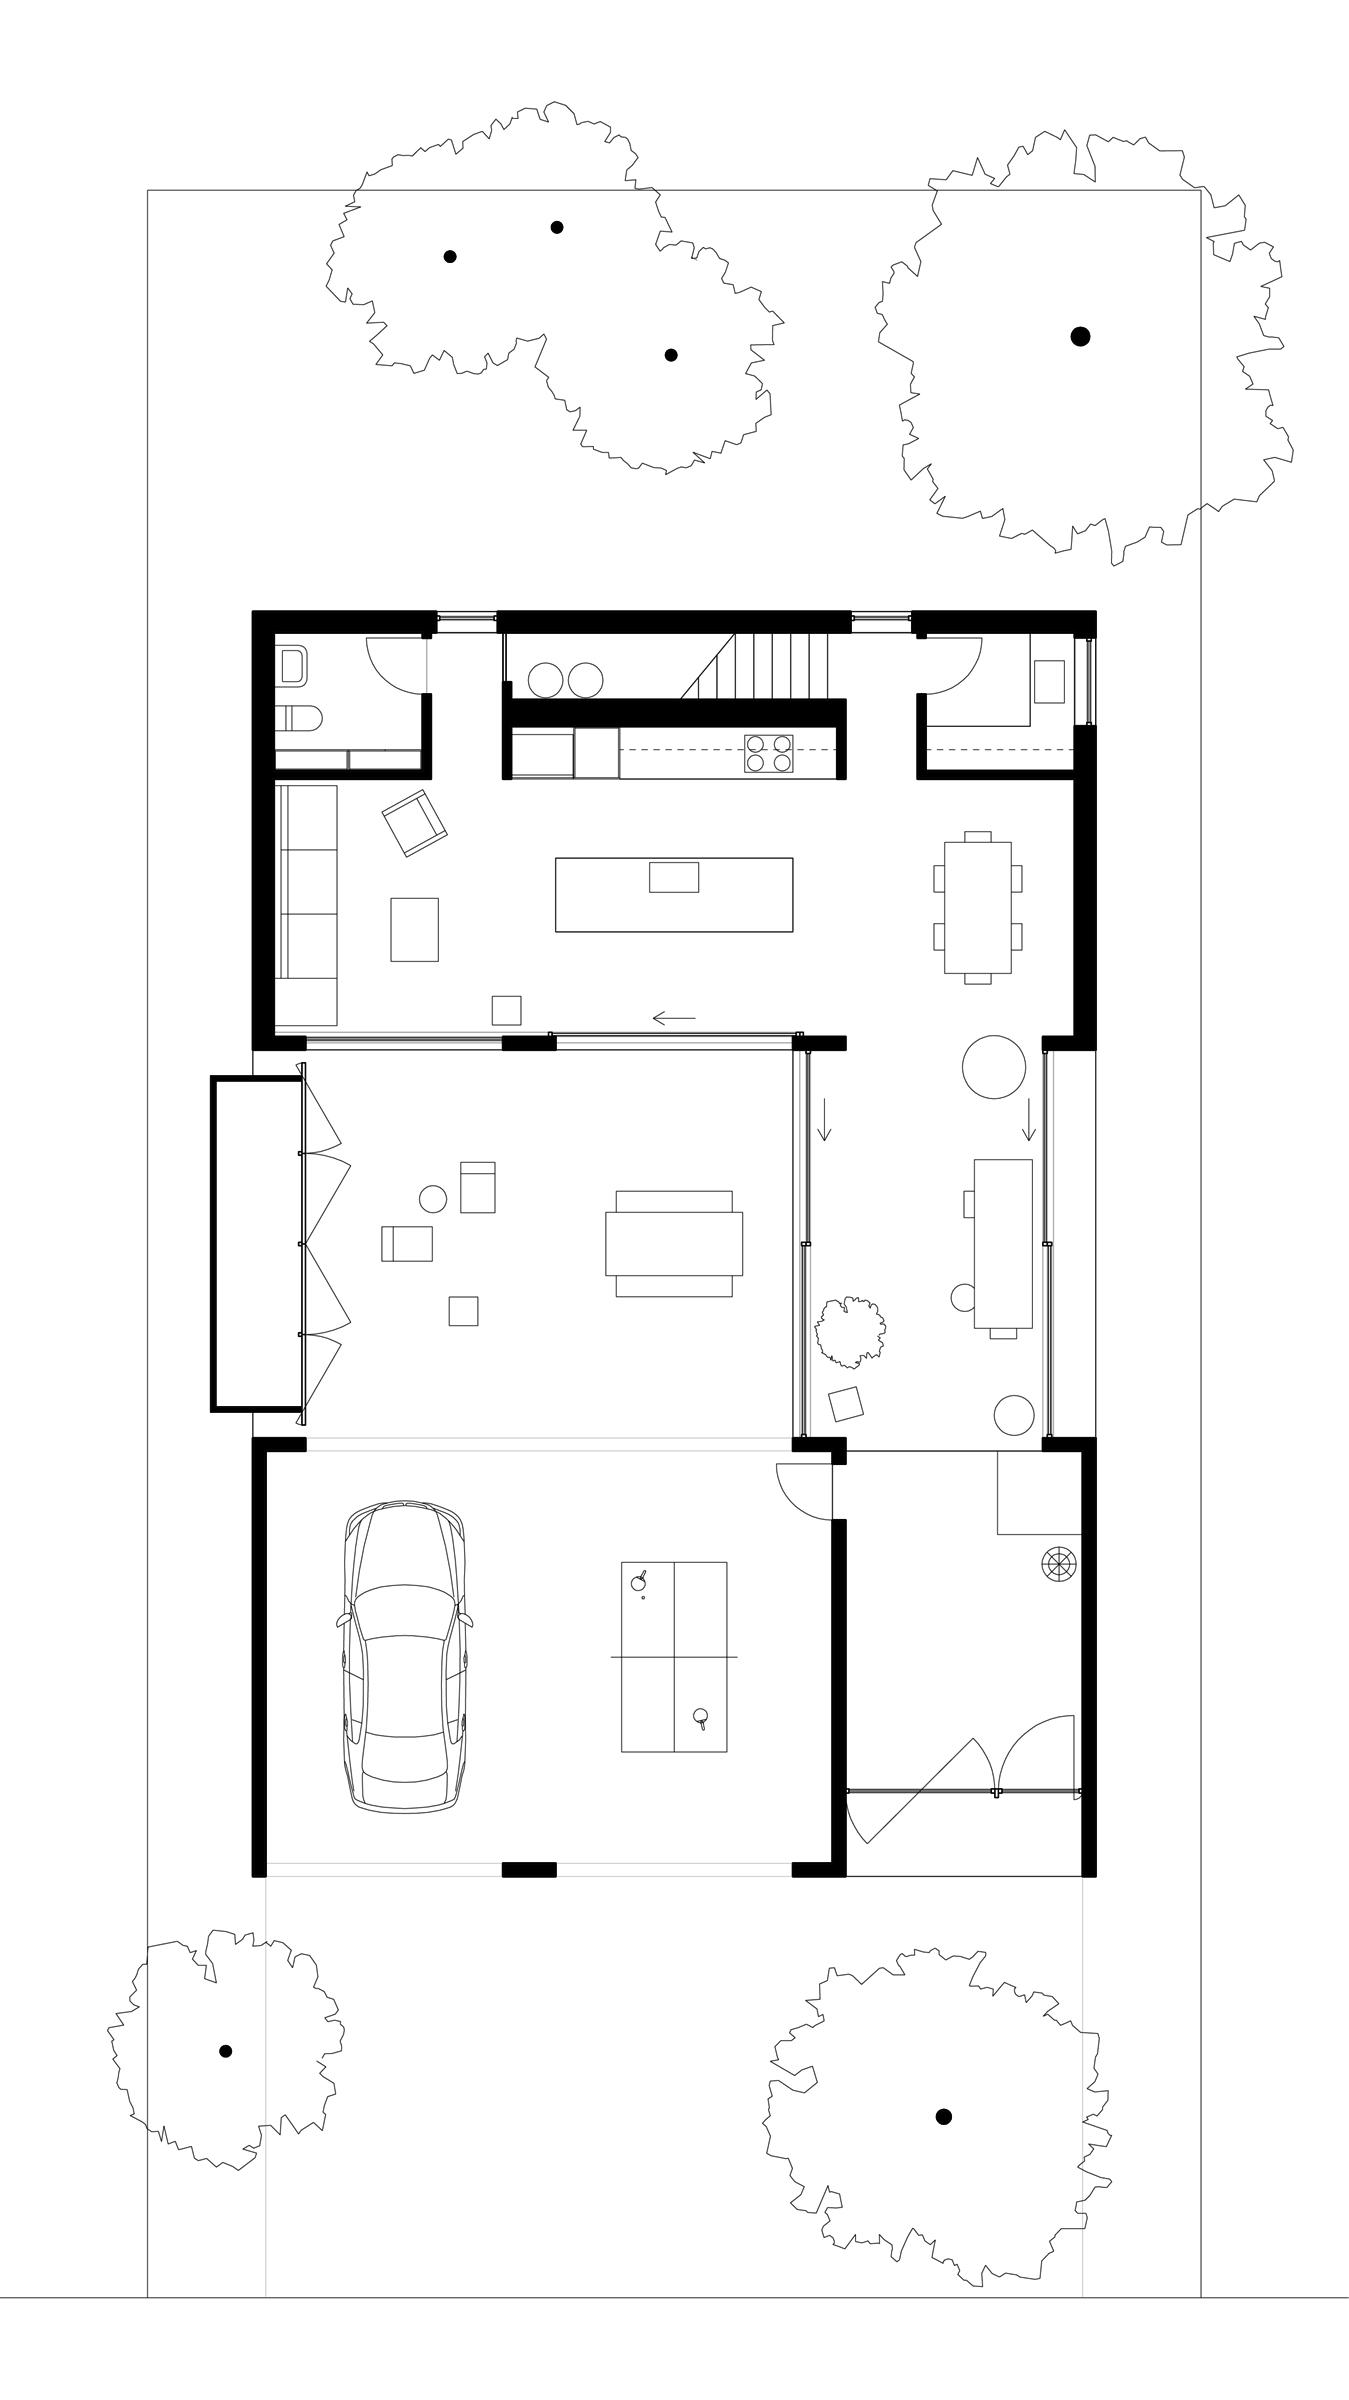 West Linn House. Ground floor plan